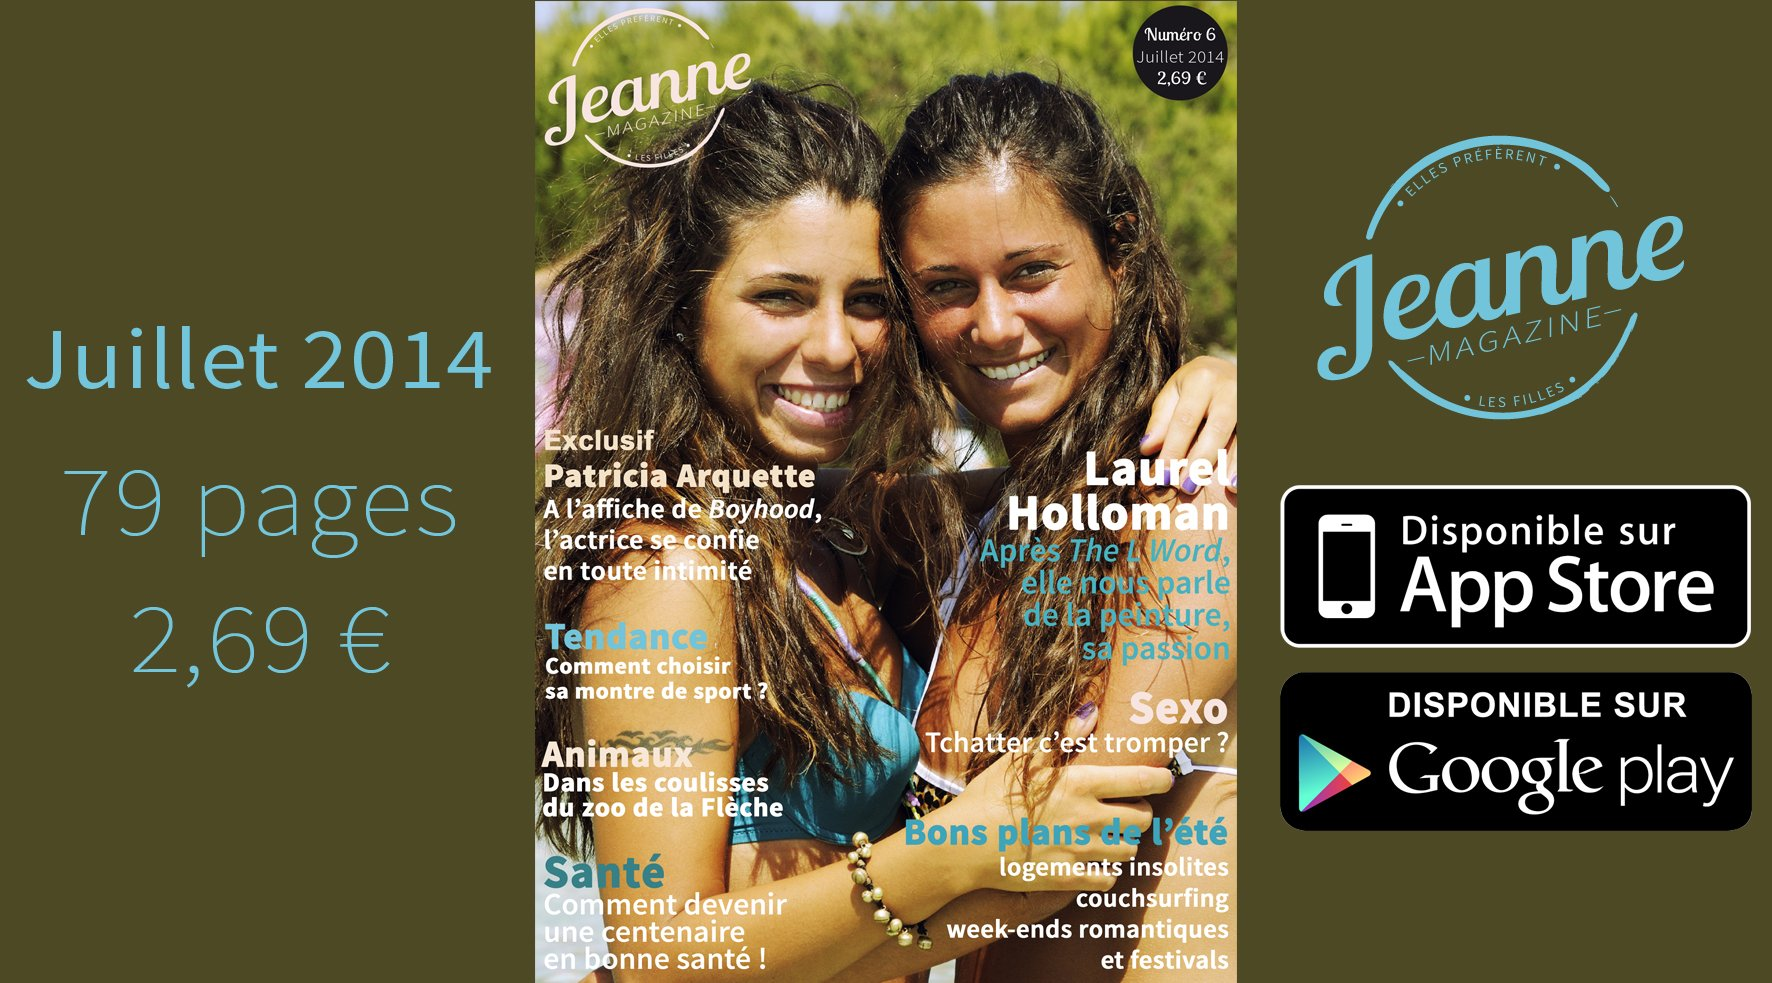 Jeanne Magazine n°6 – juillet 2014